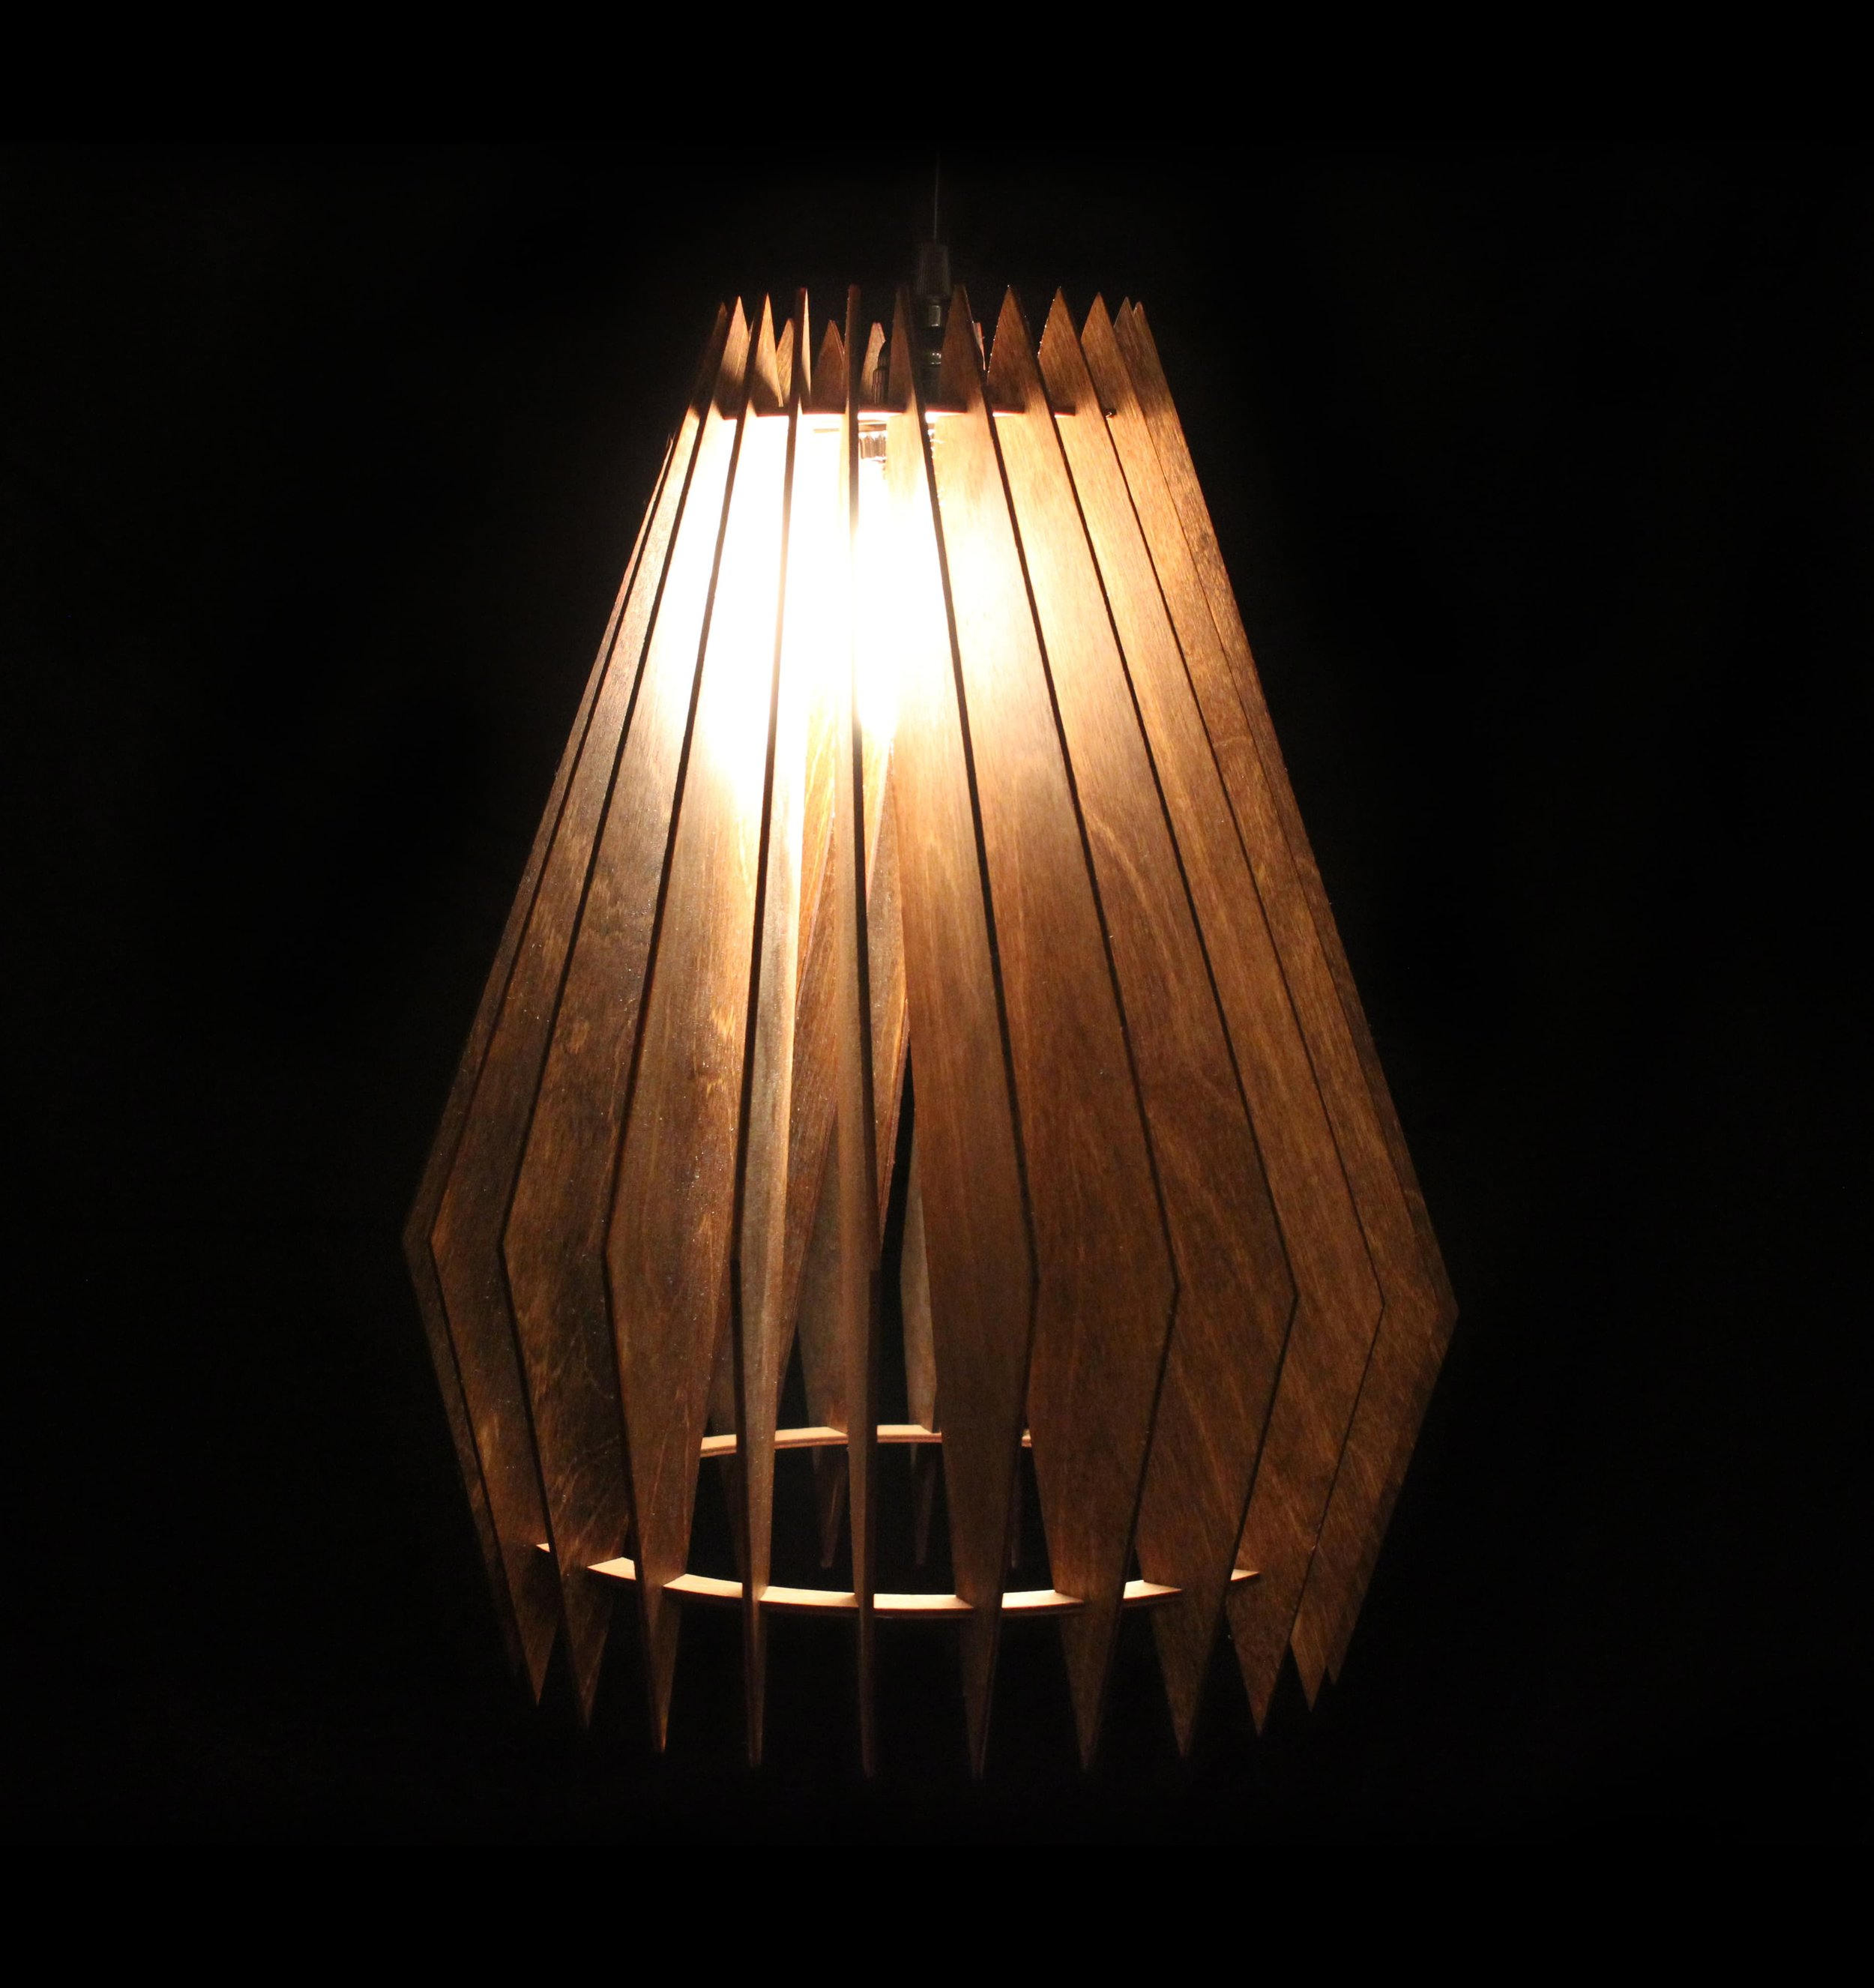 pyravlon 2 – handmade laser cut parametric postmodern interior light lamp terraform design.jpg